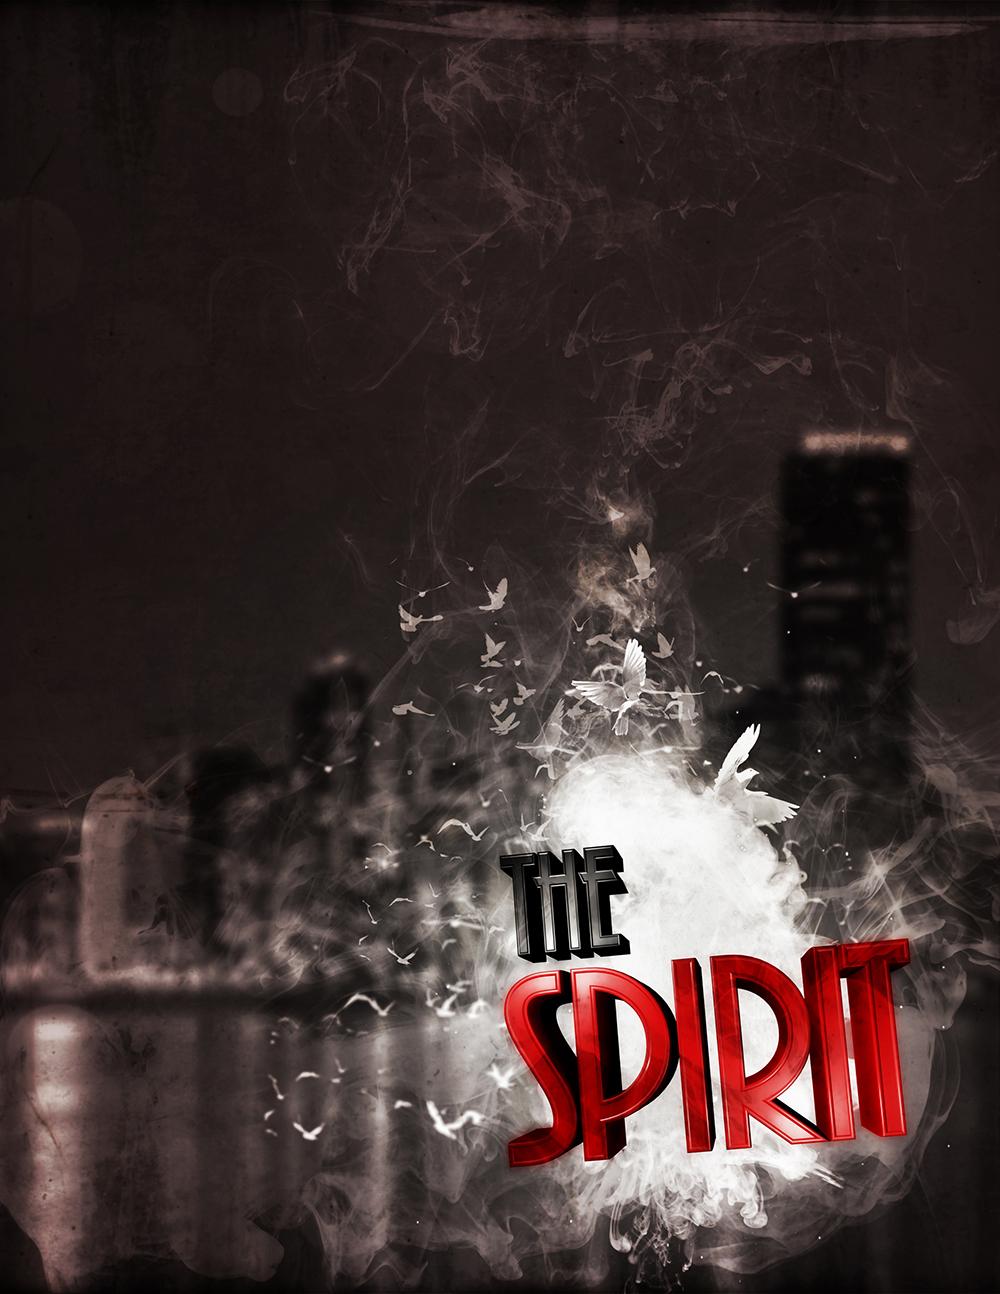 TheSpirit2_2000.jpg